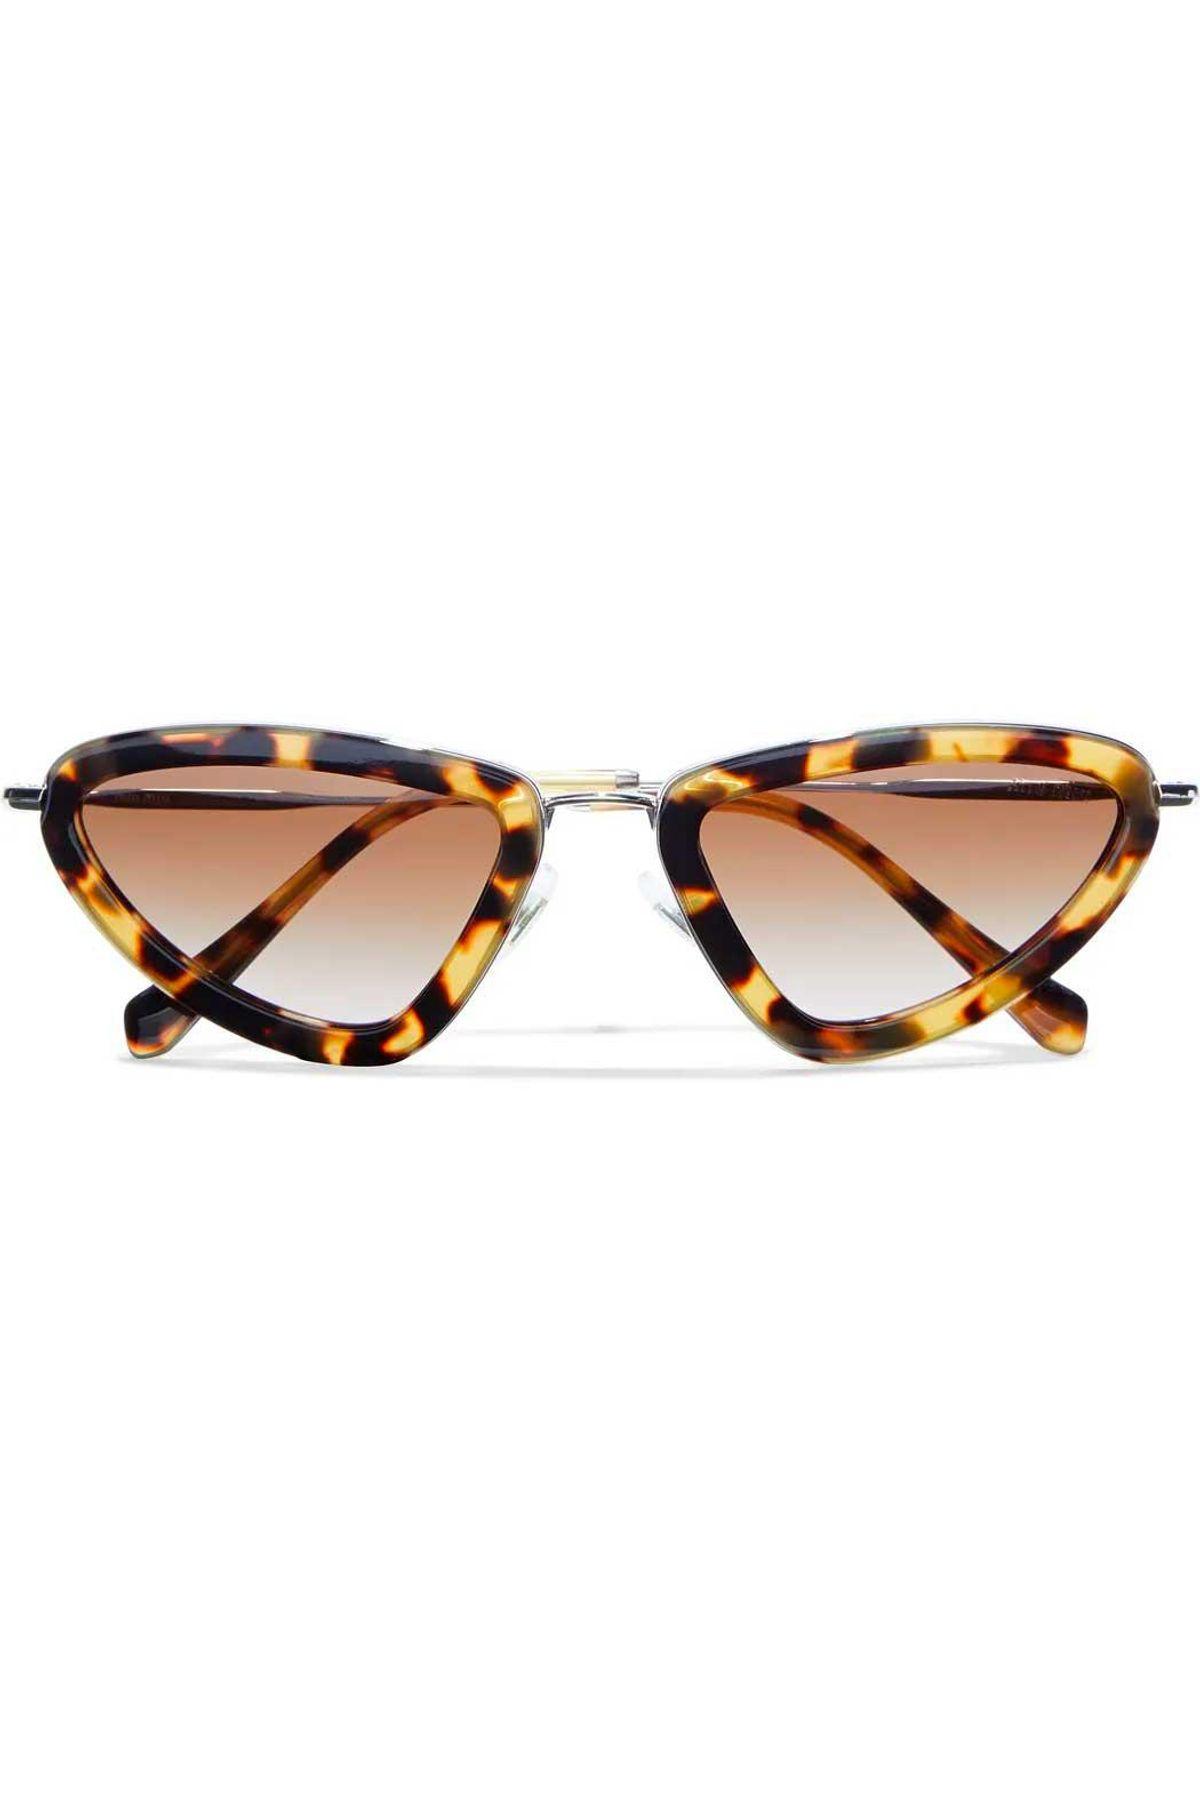 miu miu cat eye silver tone and tortoiseshell acetate sunglasses